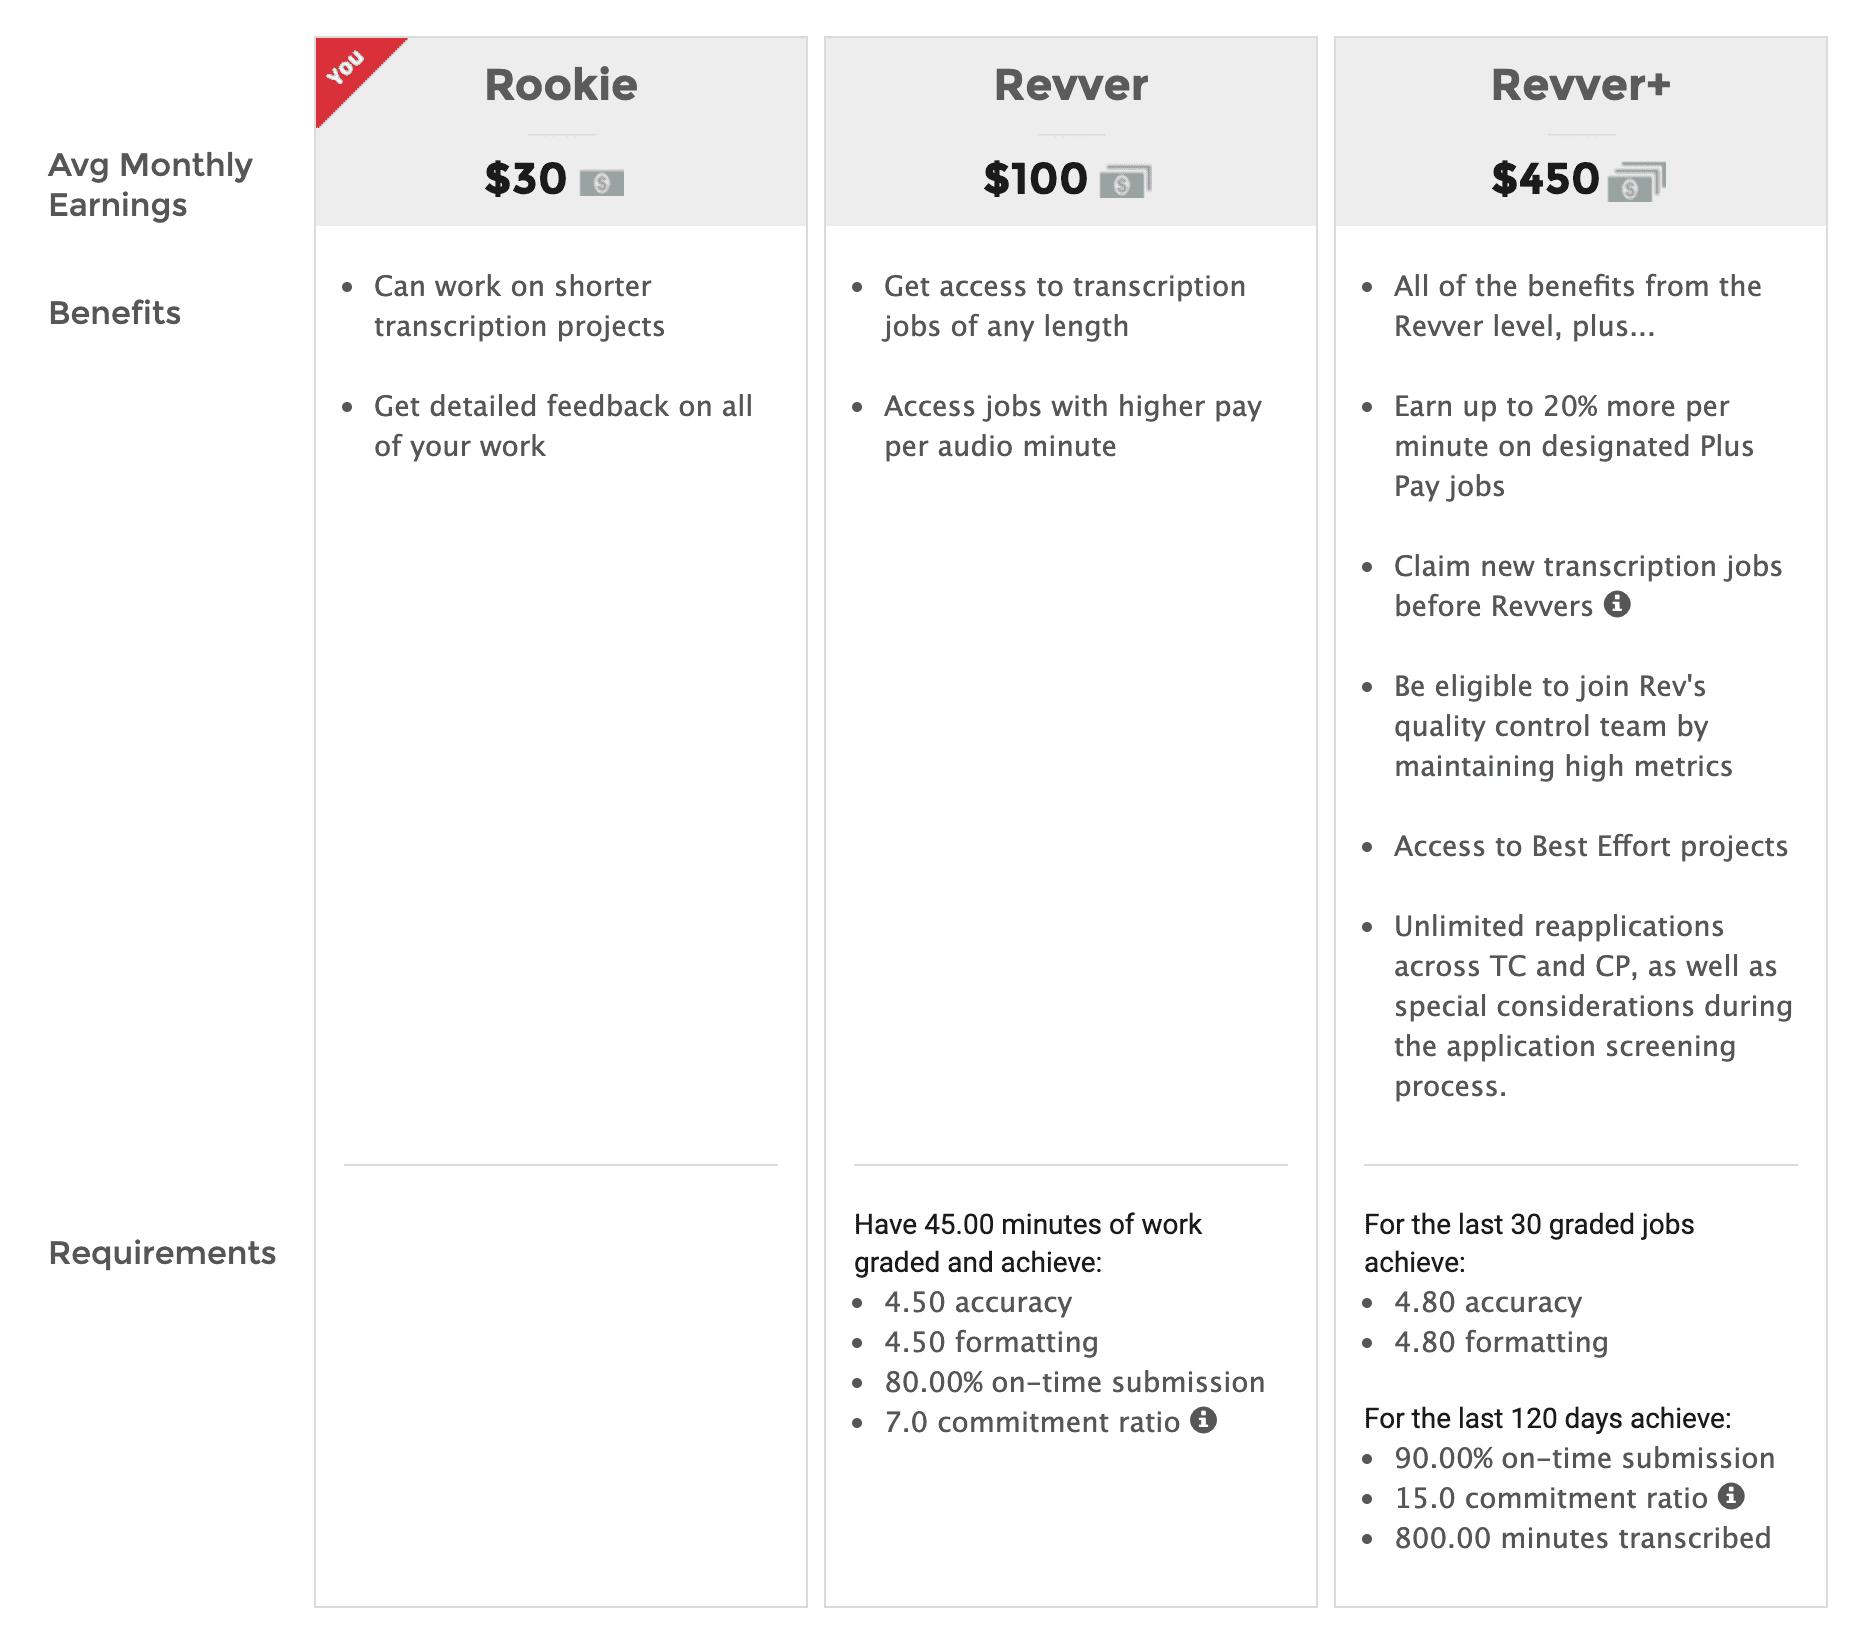 Revver Levels chart